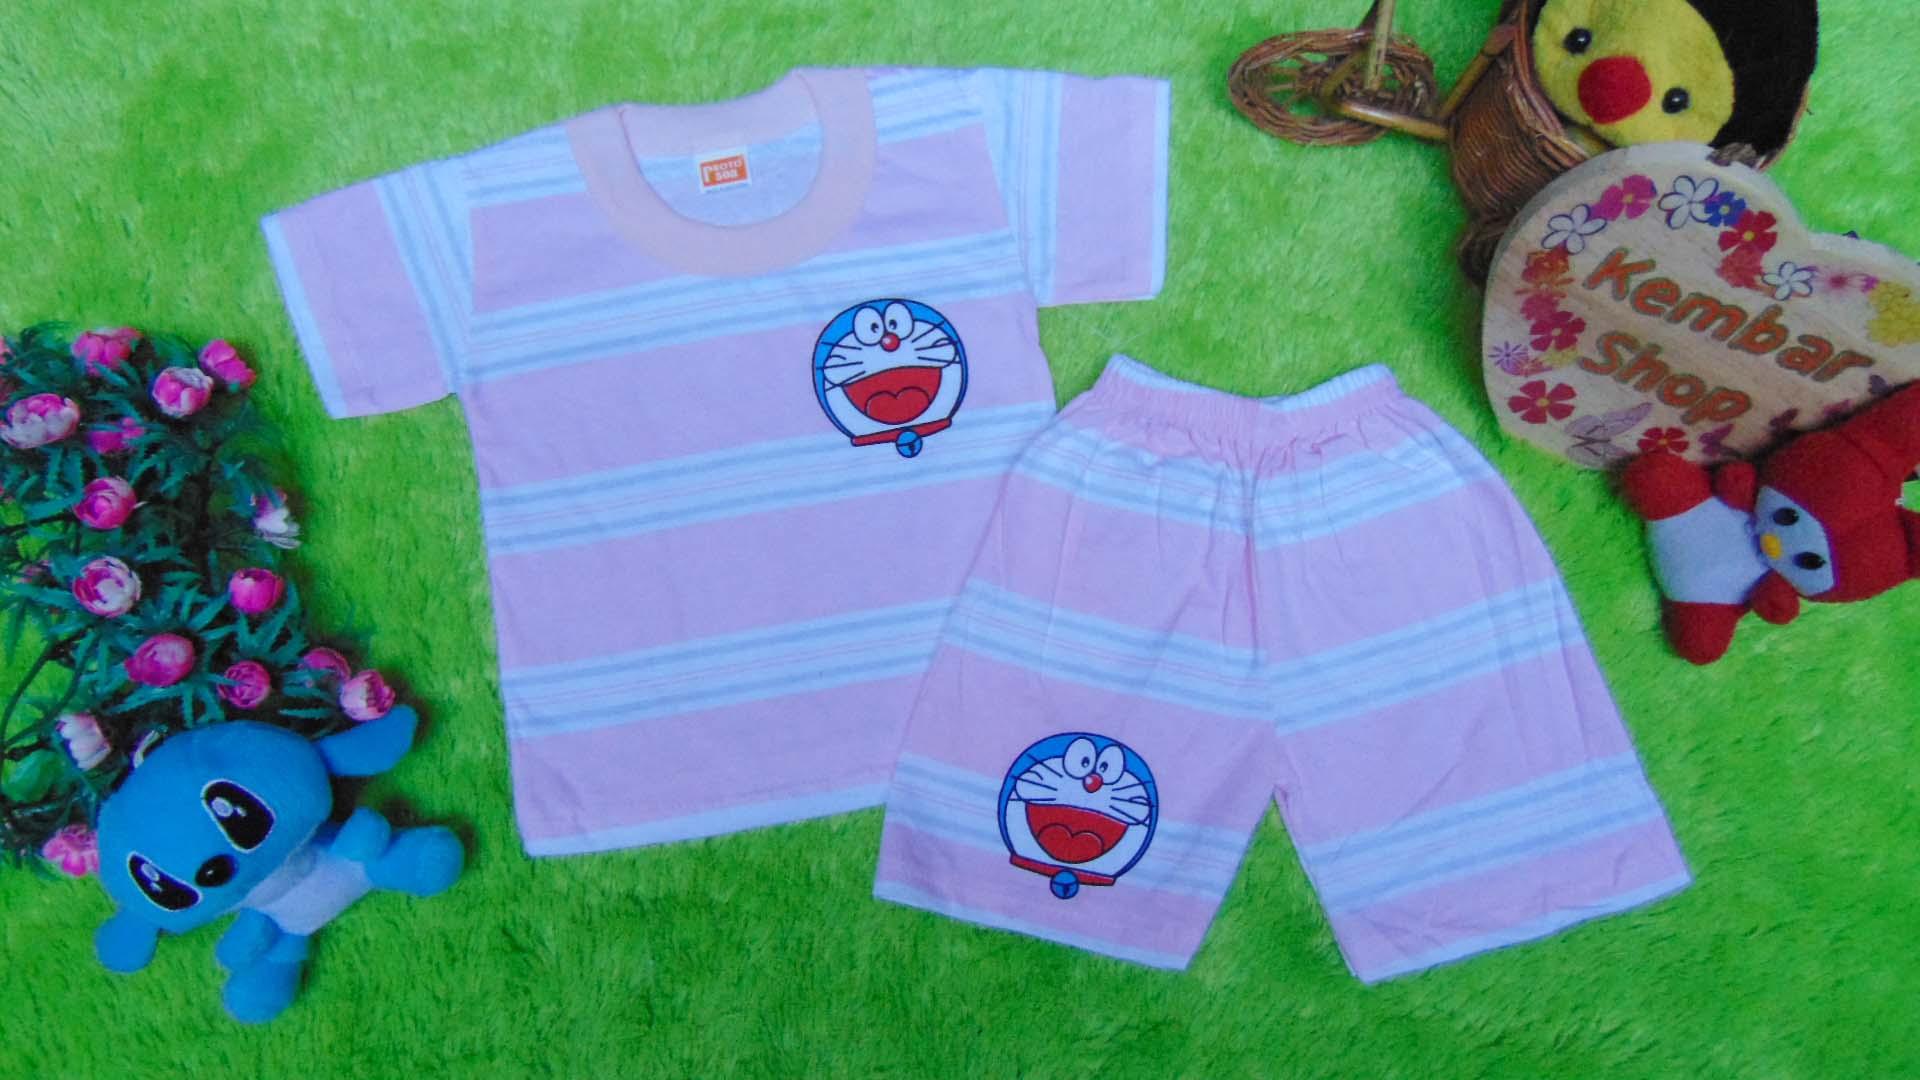 FREE KARTU UCAPAN Kado Lahiran Paket Kado Bayi Baby Gift Box Doraemon Pink 2in1 49 terdiri dari setelan kaos doraemon 0-12bln dan boneka doraemon lucu